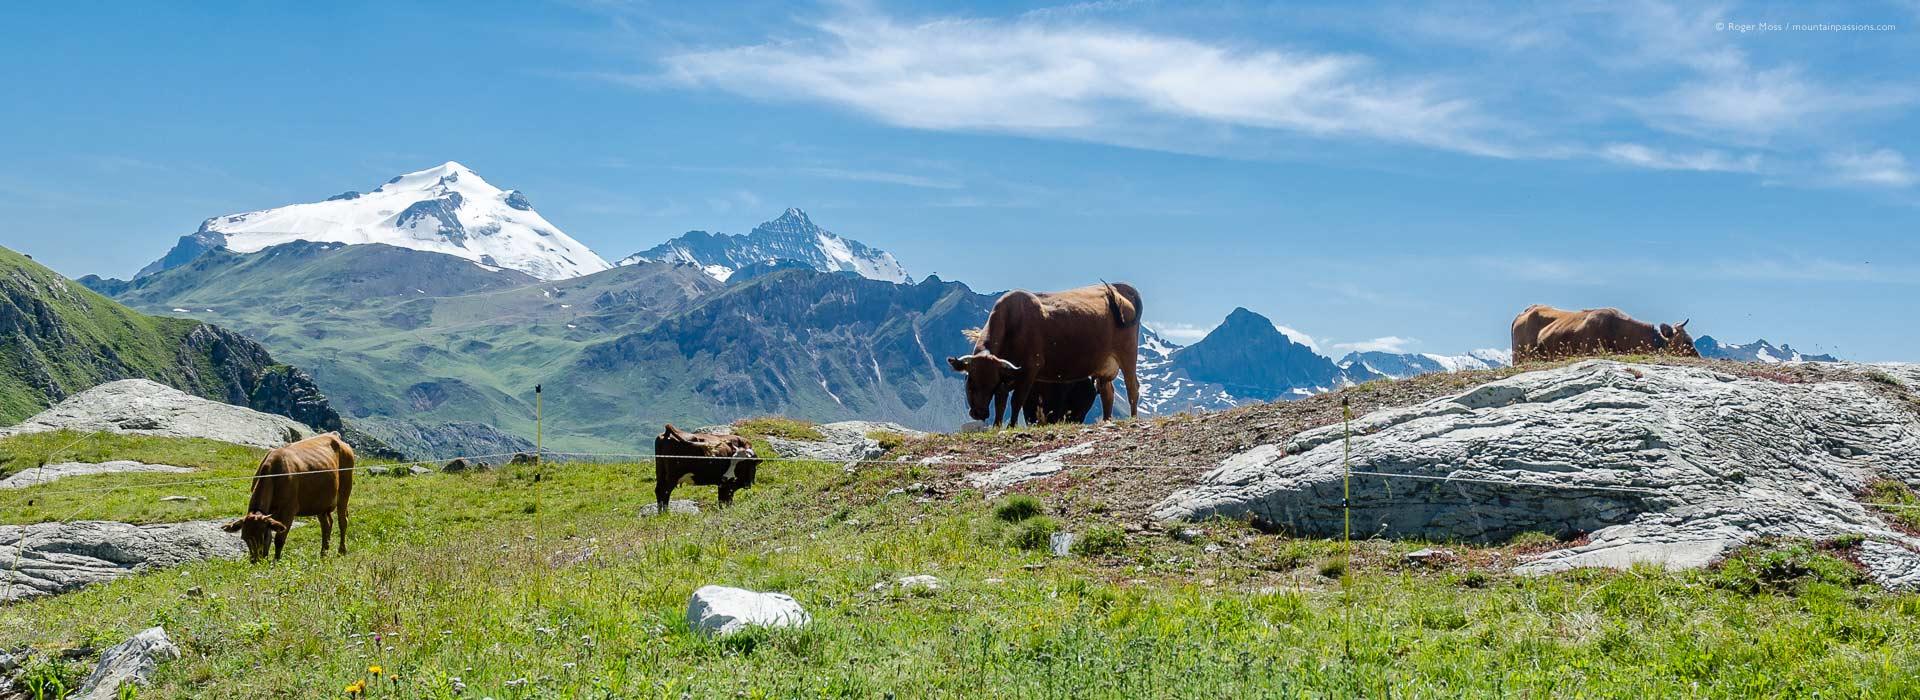 Dairy cattle in high Alpine pastures